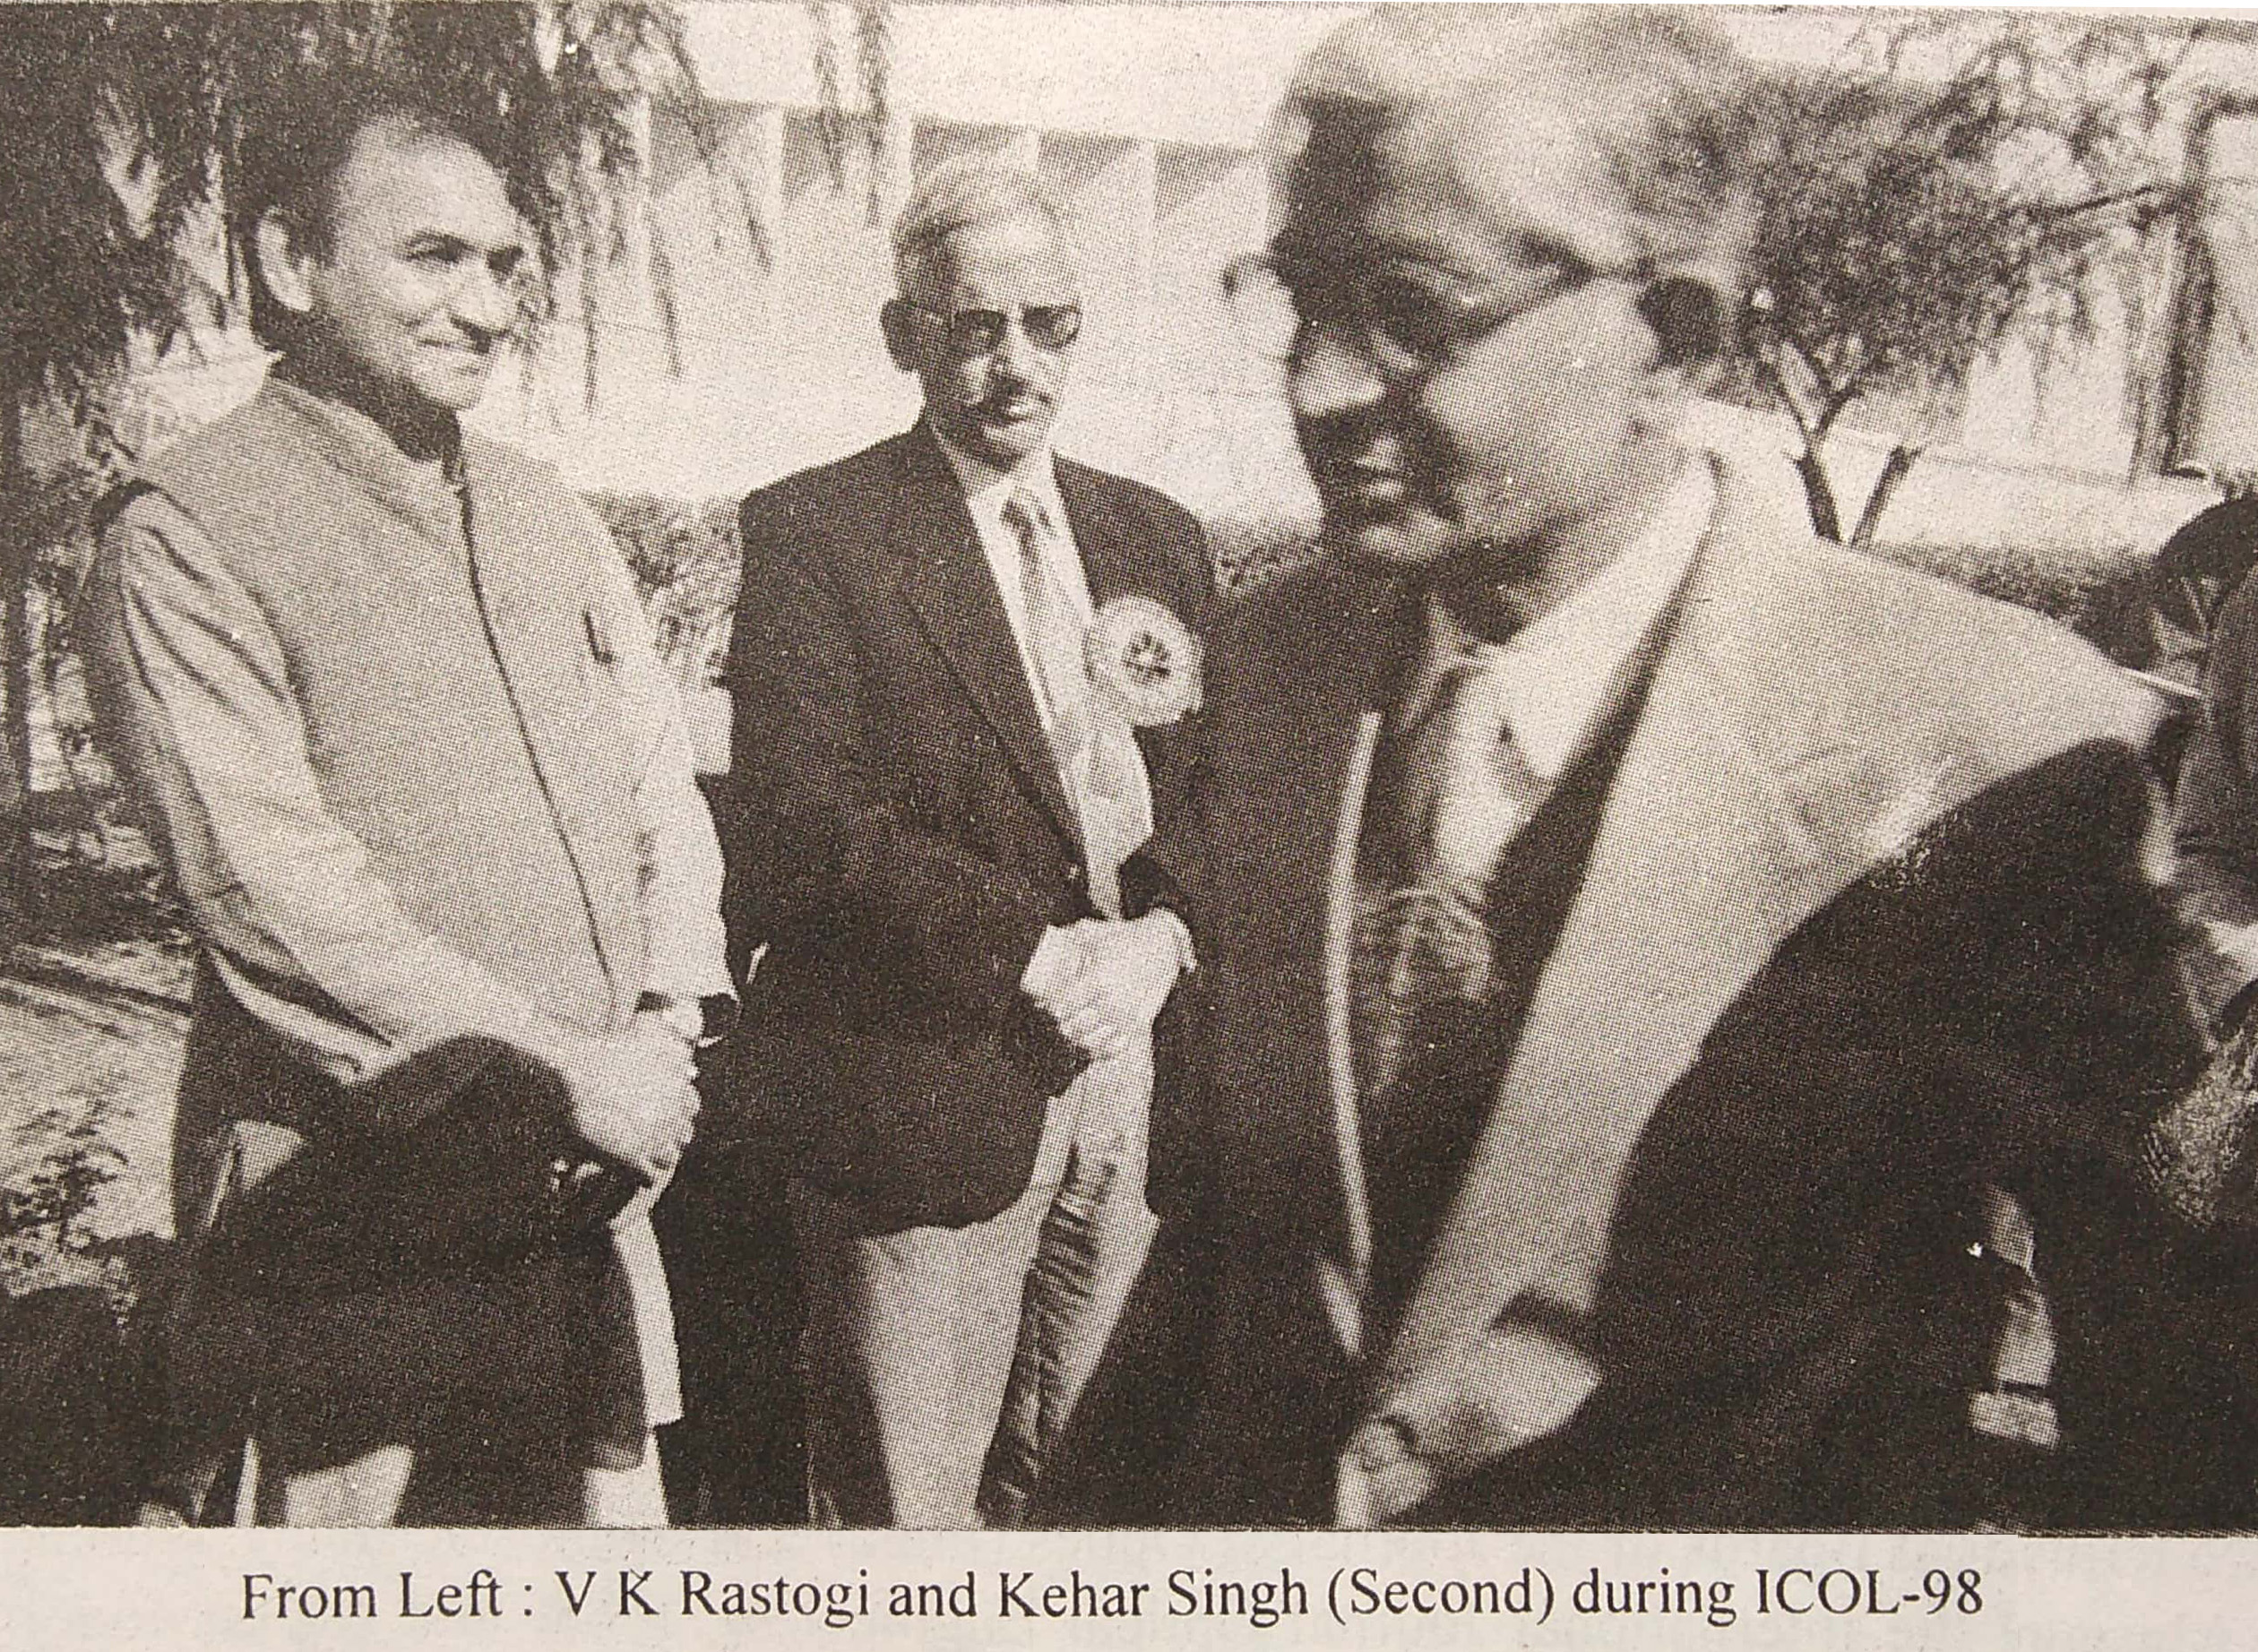 ICOL-98 VK Rastogi and Kehar Singh